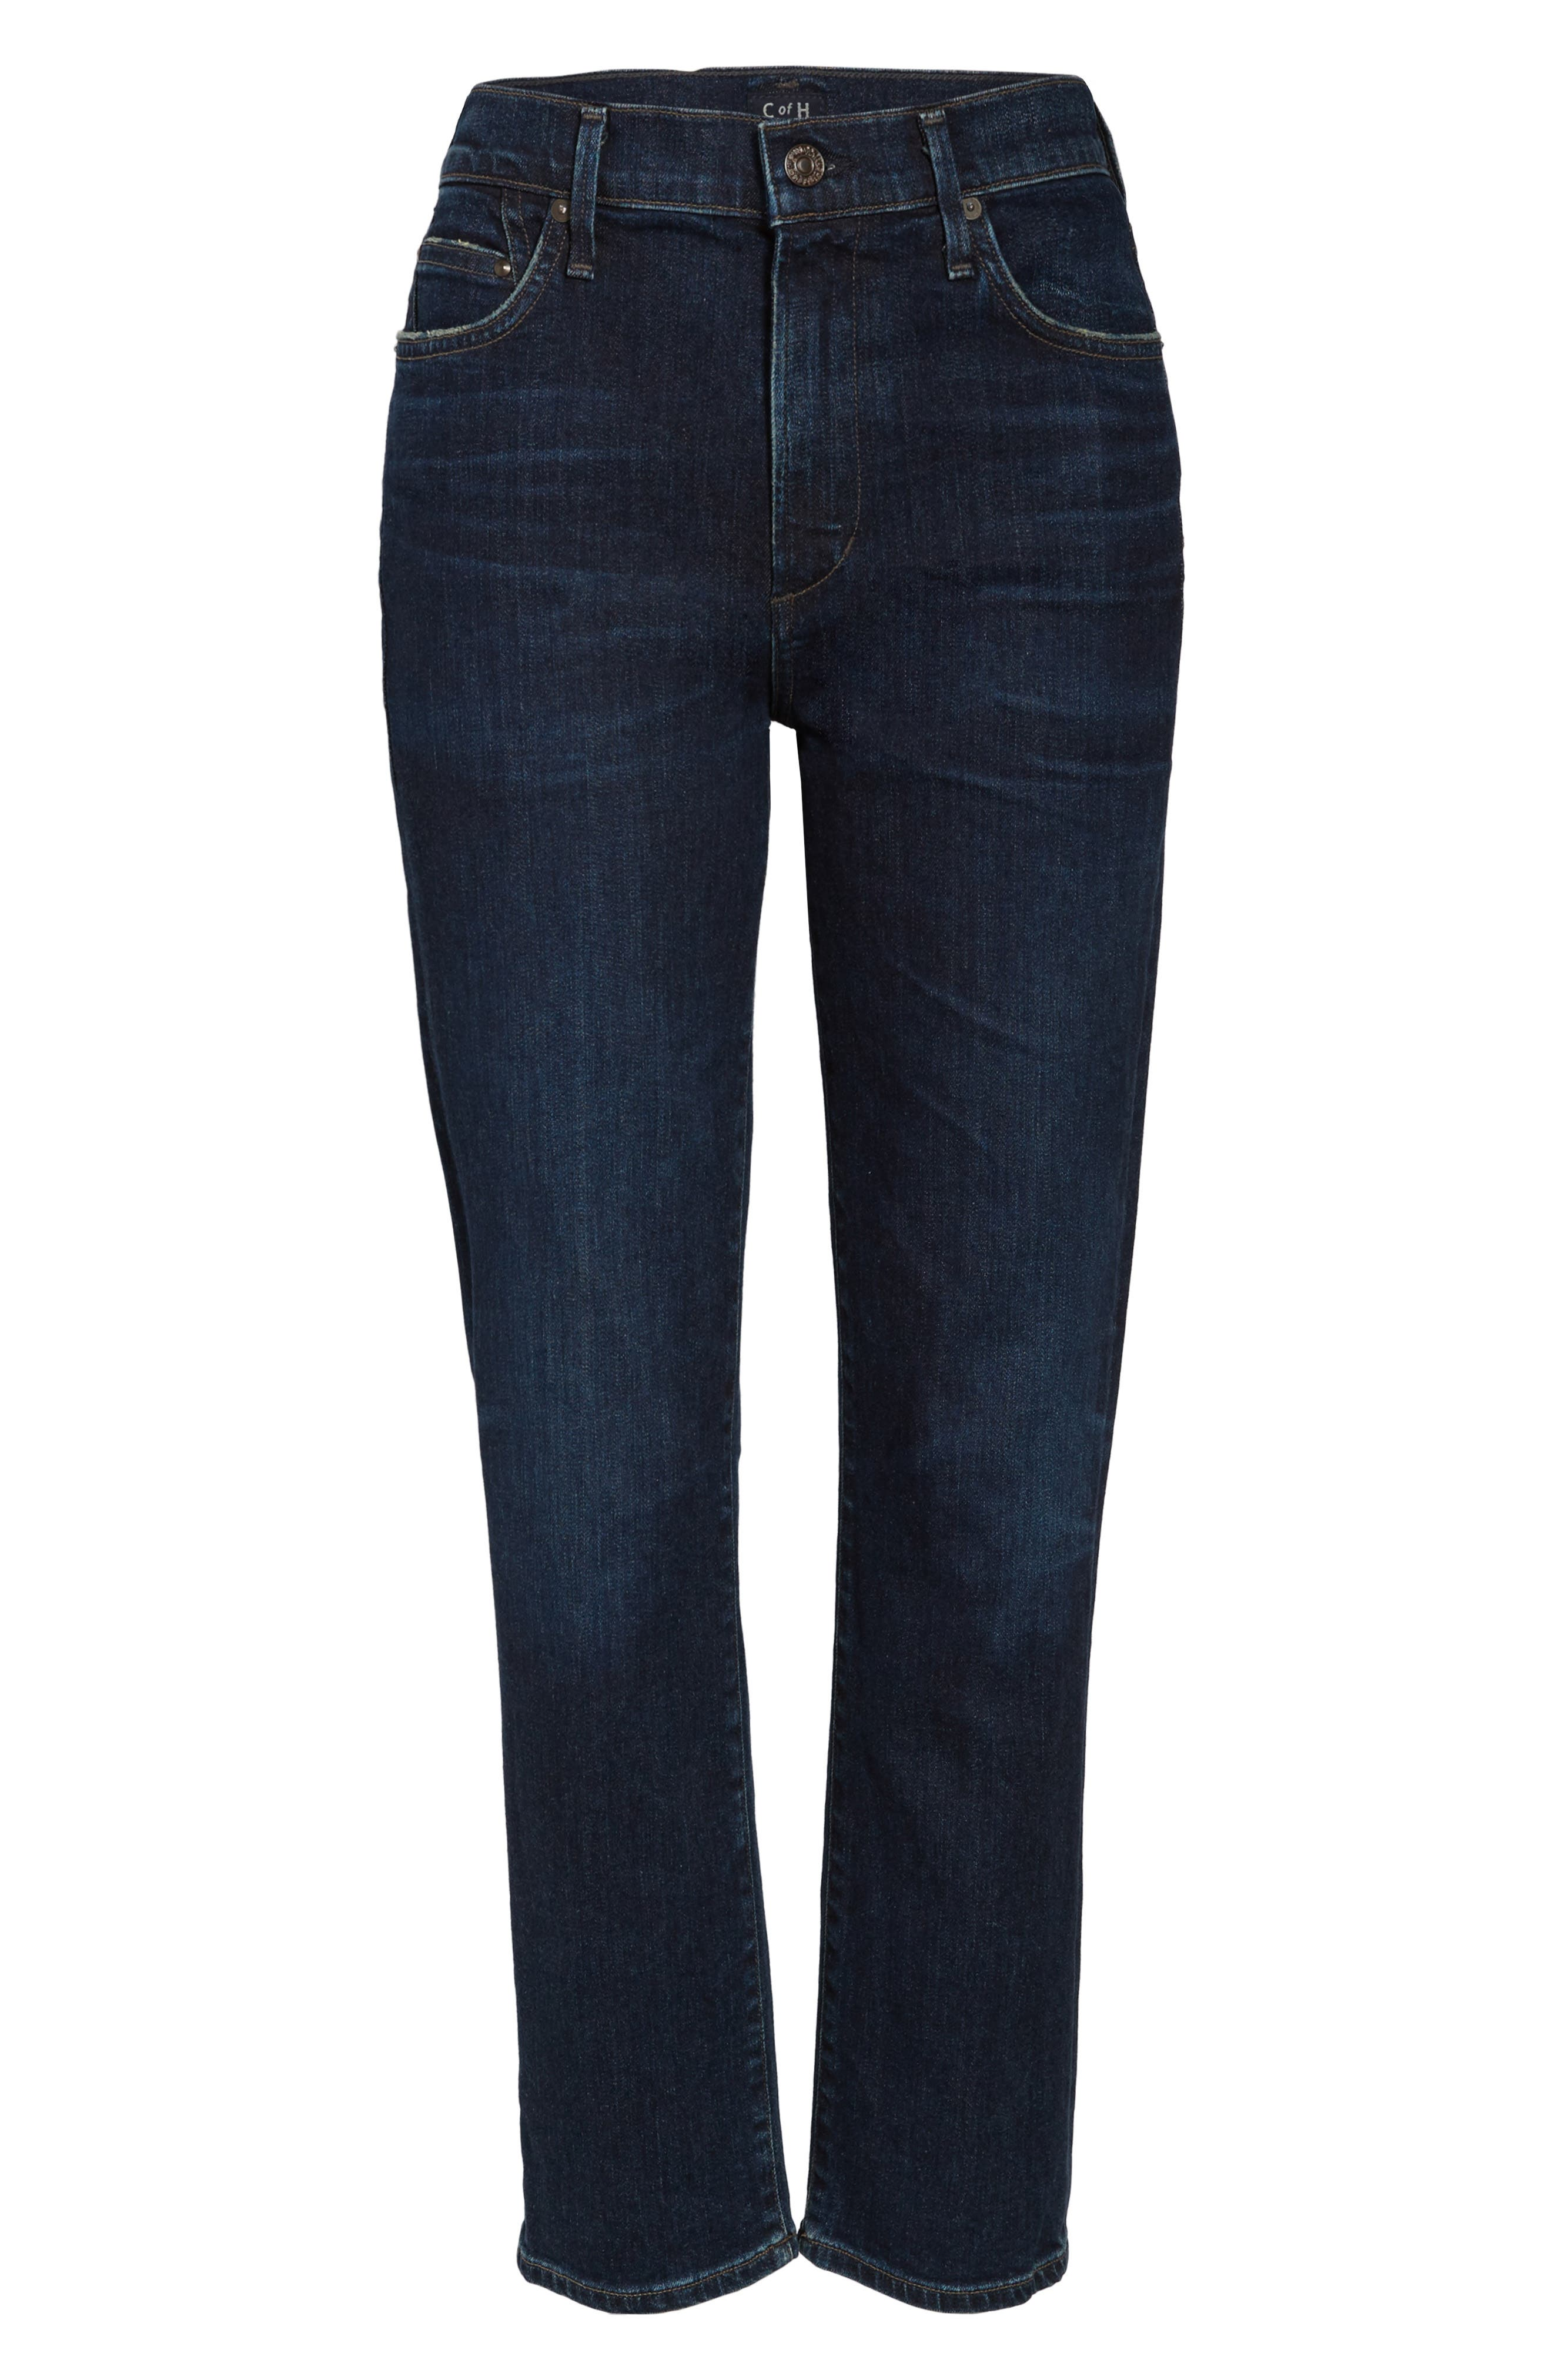 Cara Ankle Cigarette Jeans,                             Alternate thumbnail 7, color,                             401